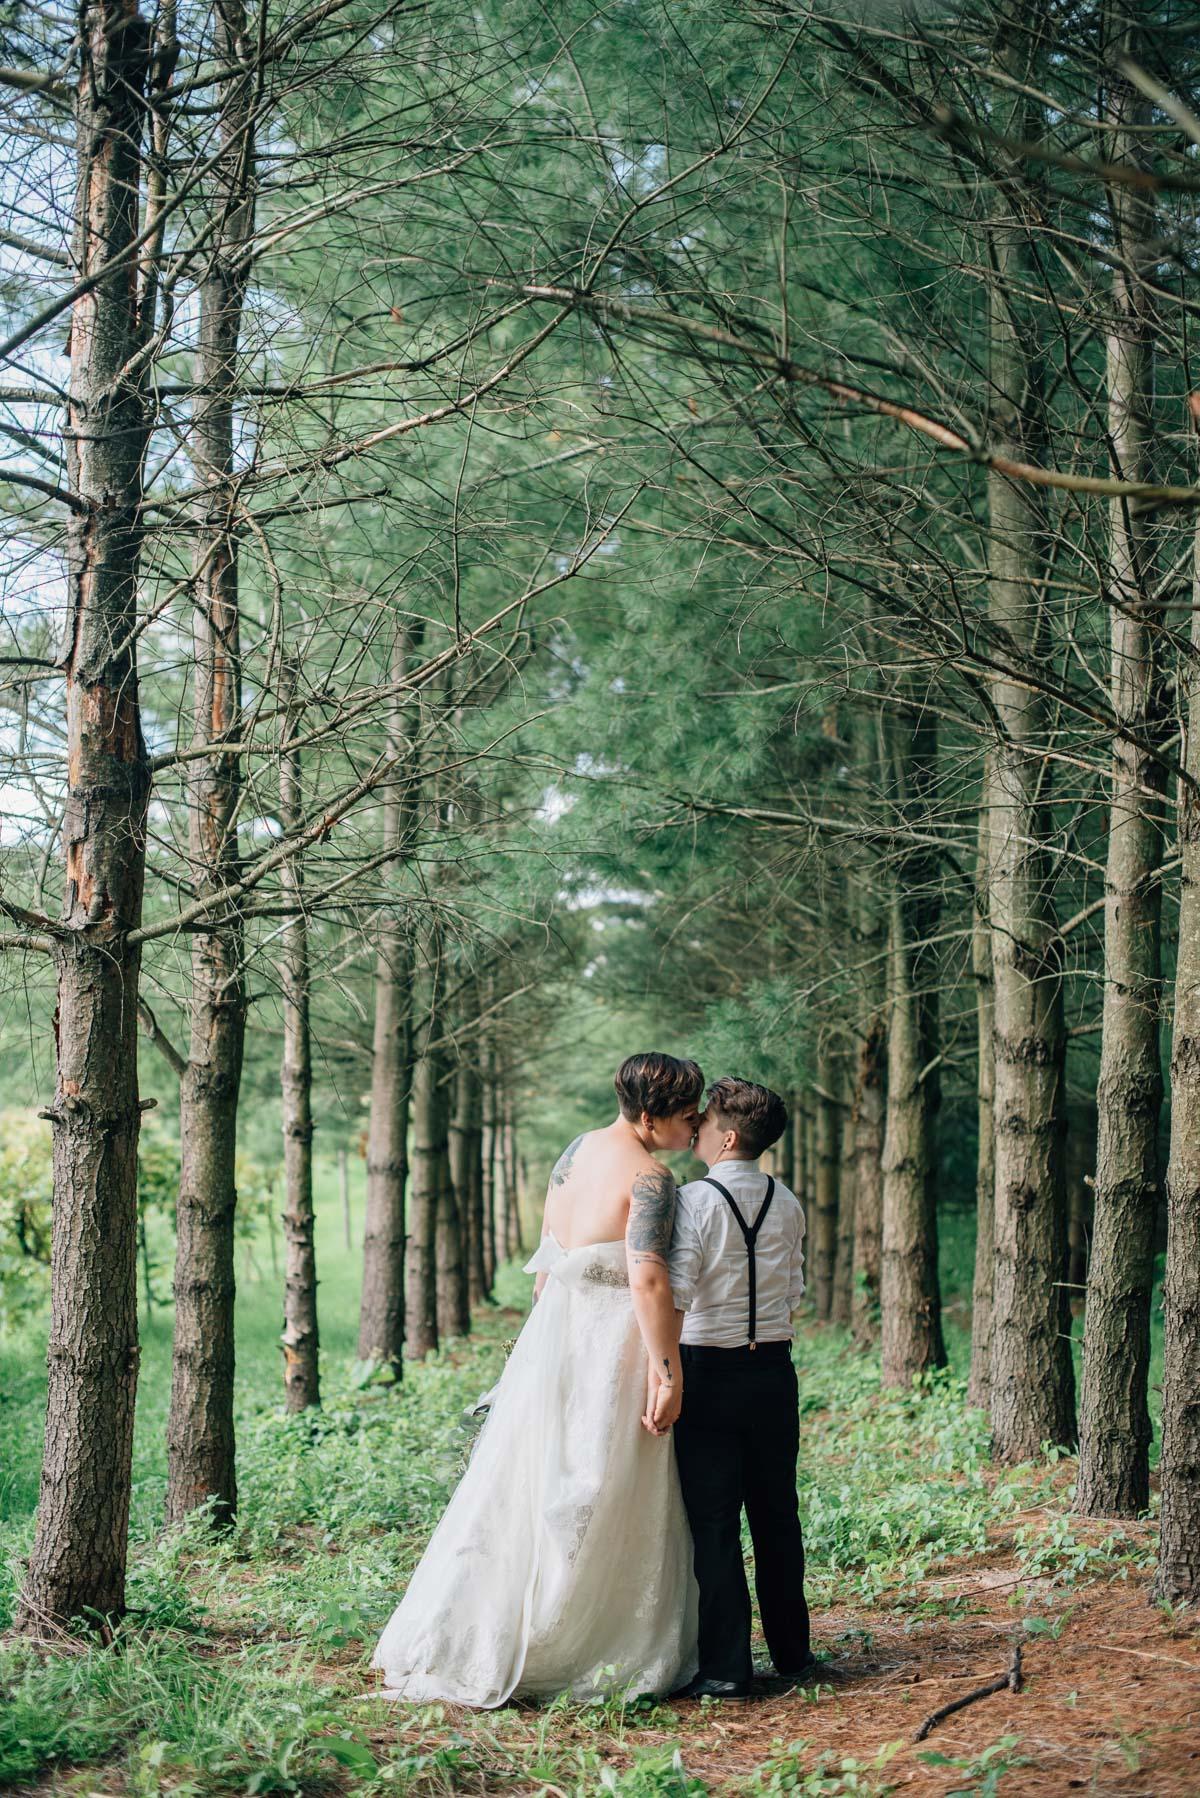 sara-wilde-photography-vineyard-bride-swish-list-beamer-falls-manor-grimsby-wedding-52.jpg